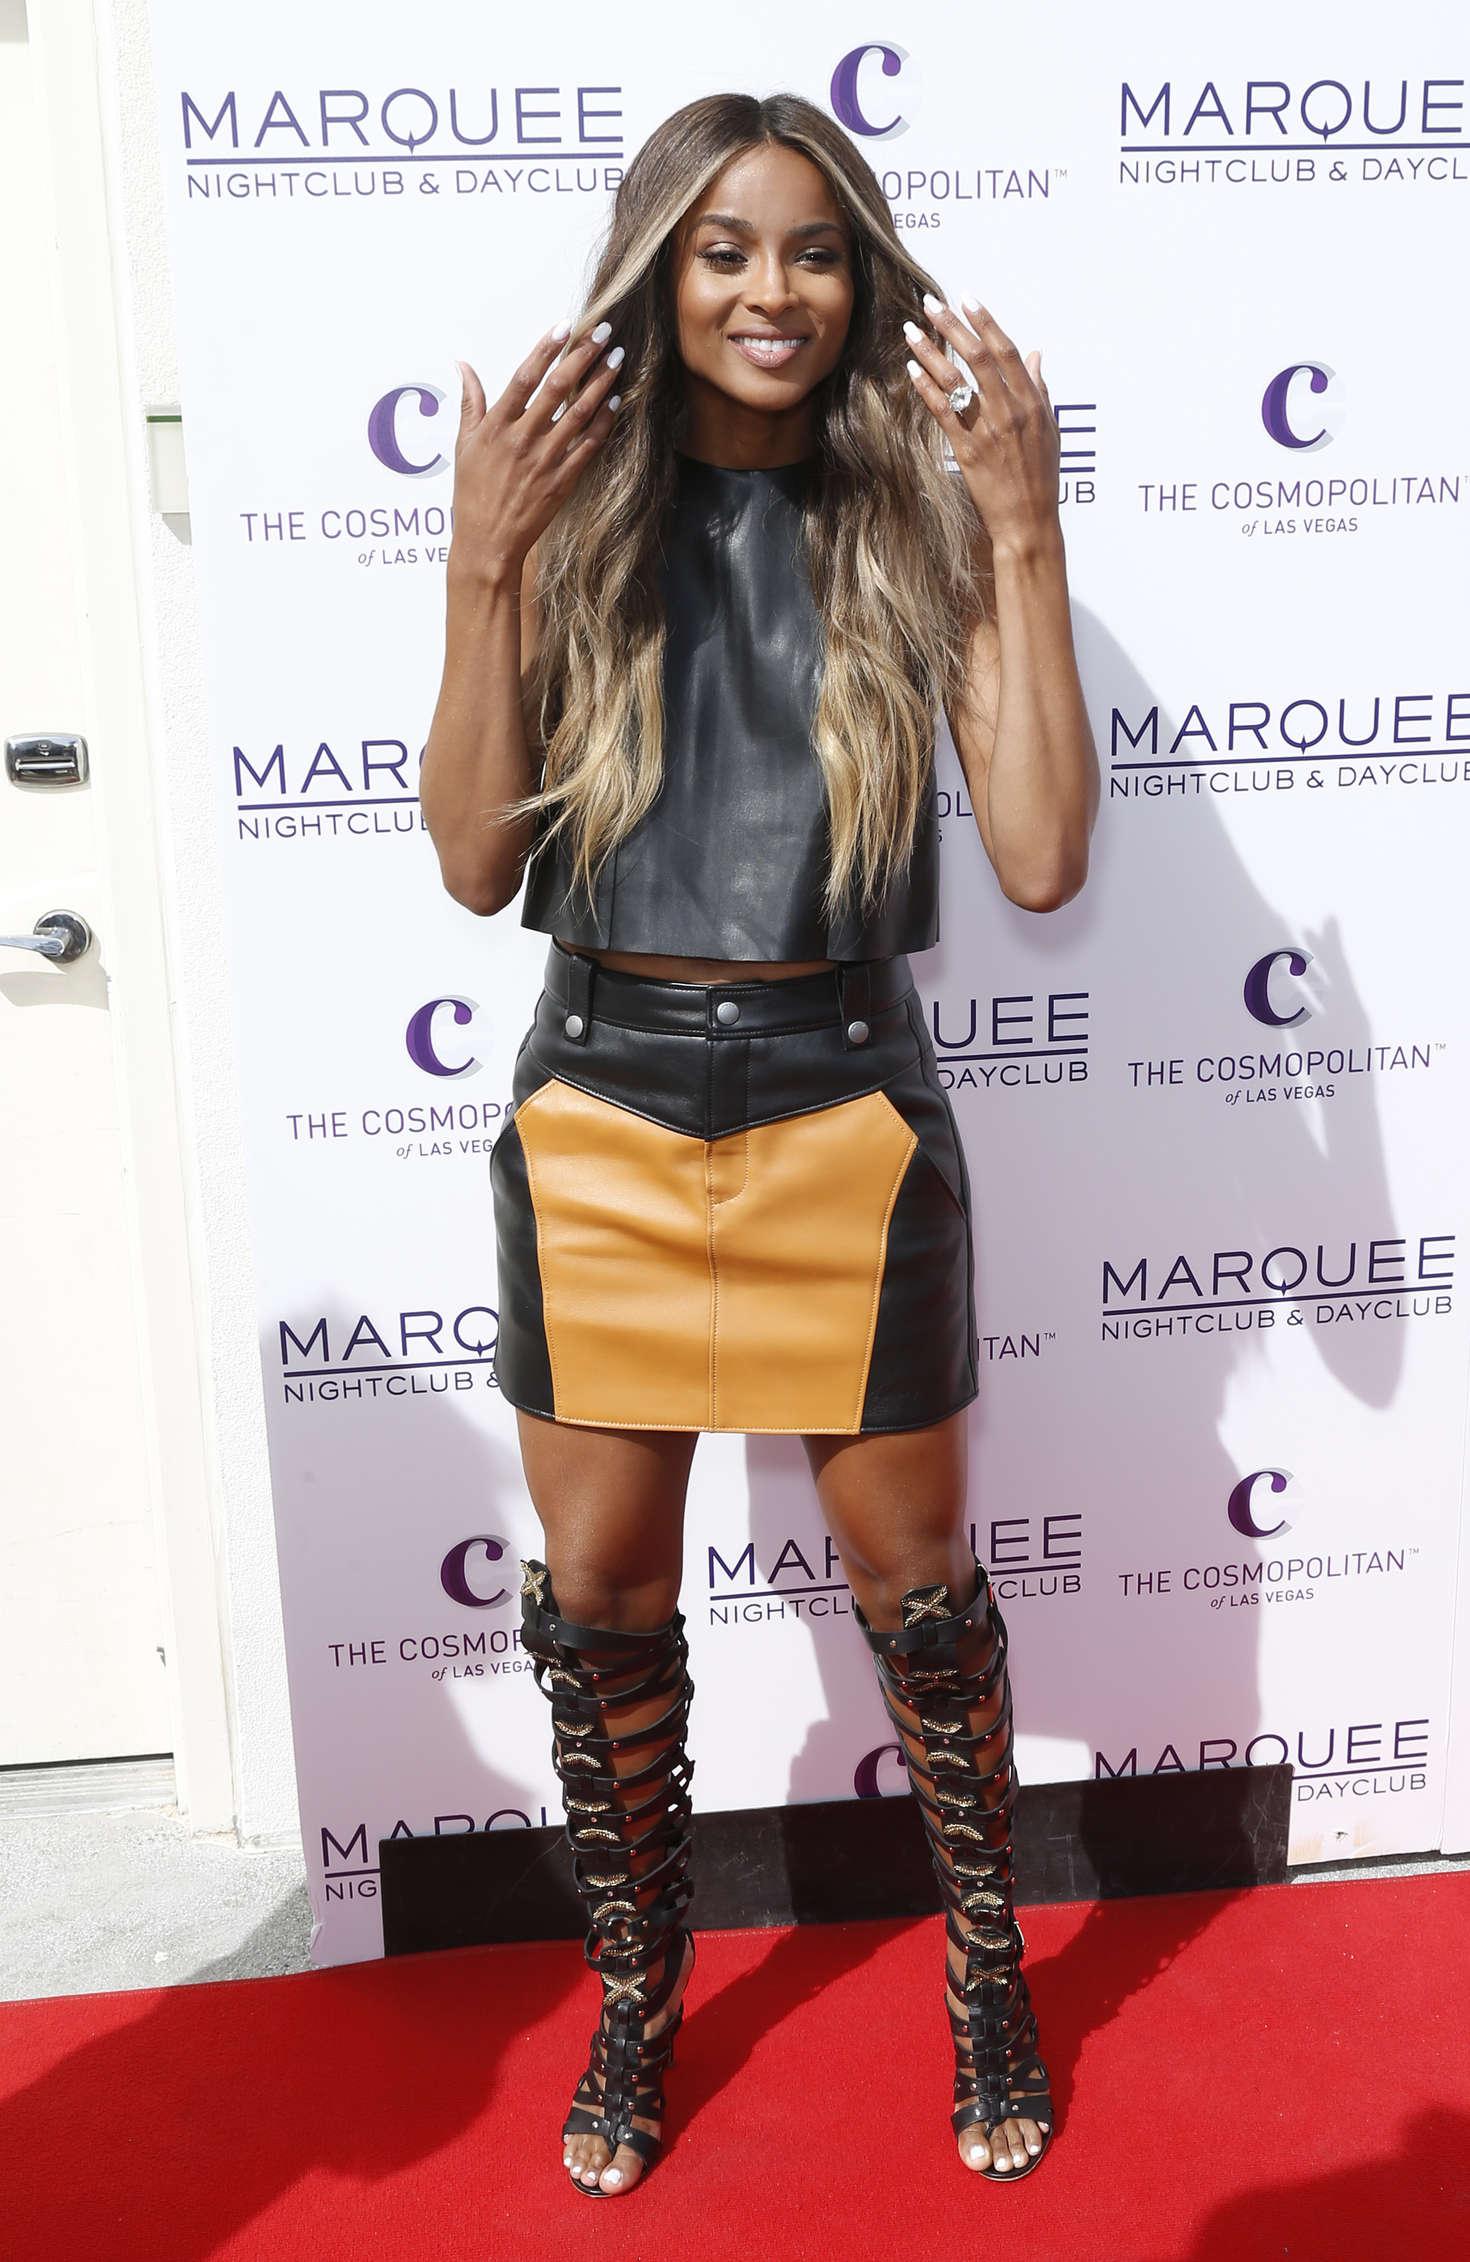 Ciara Marquee Dayclub Season Grand Opening in Las Vegas